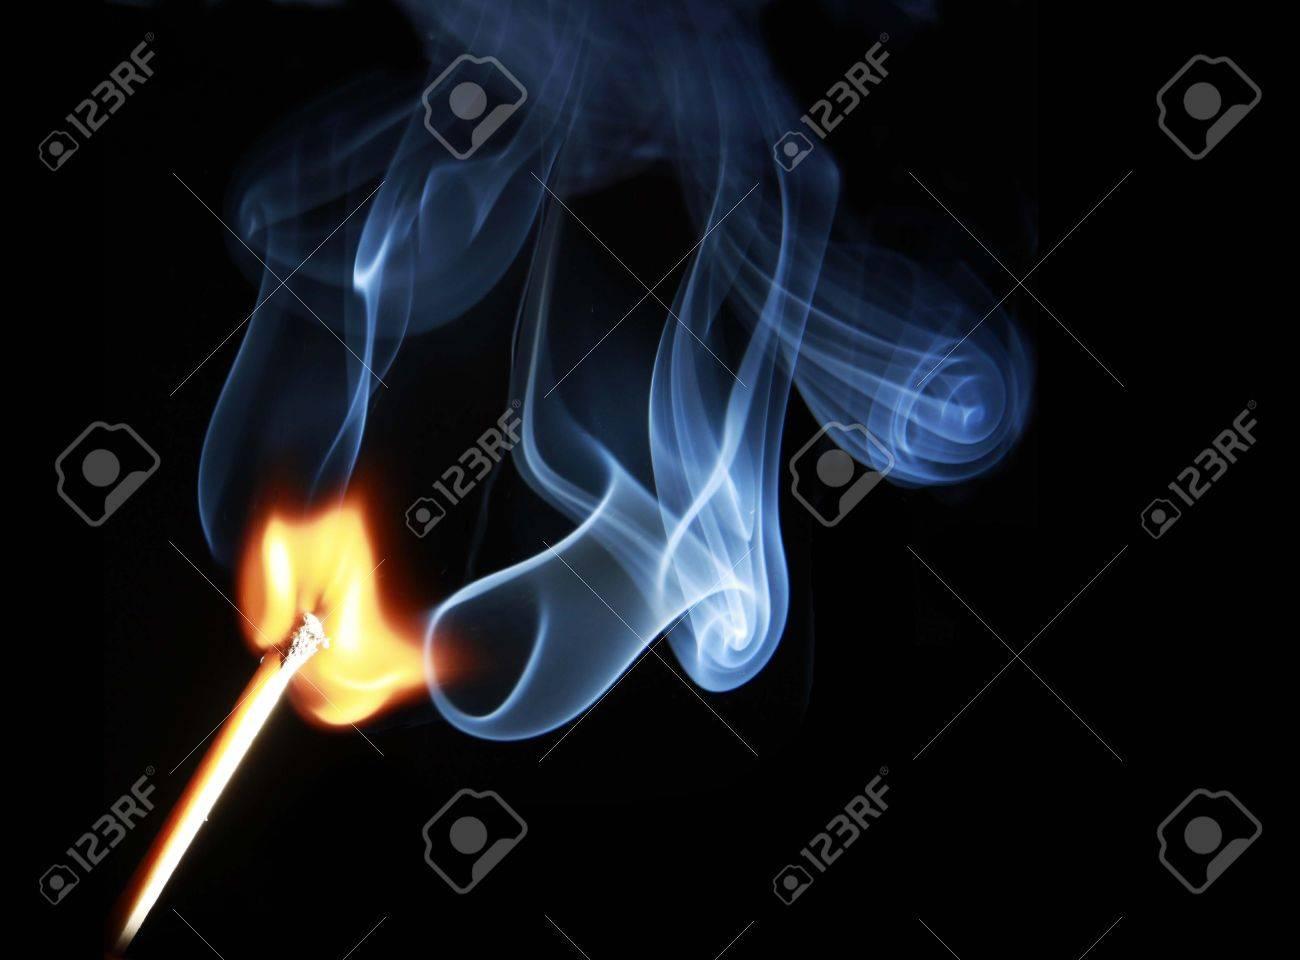 matchstick lighted, burning match stick Stock Photo - 11074992